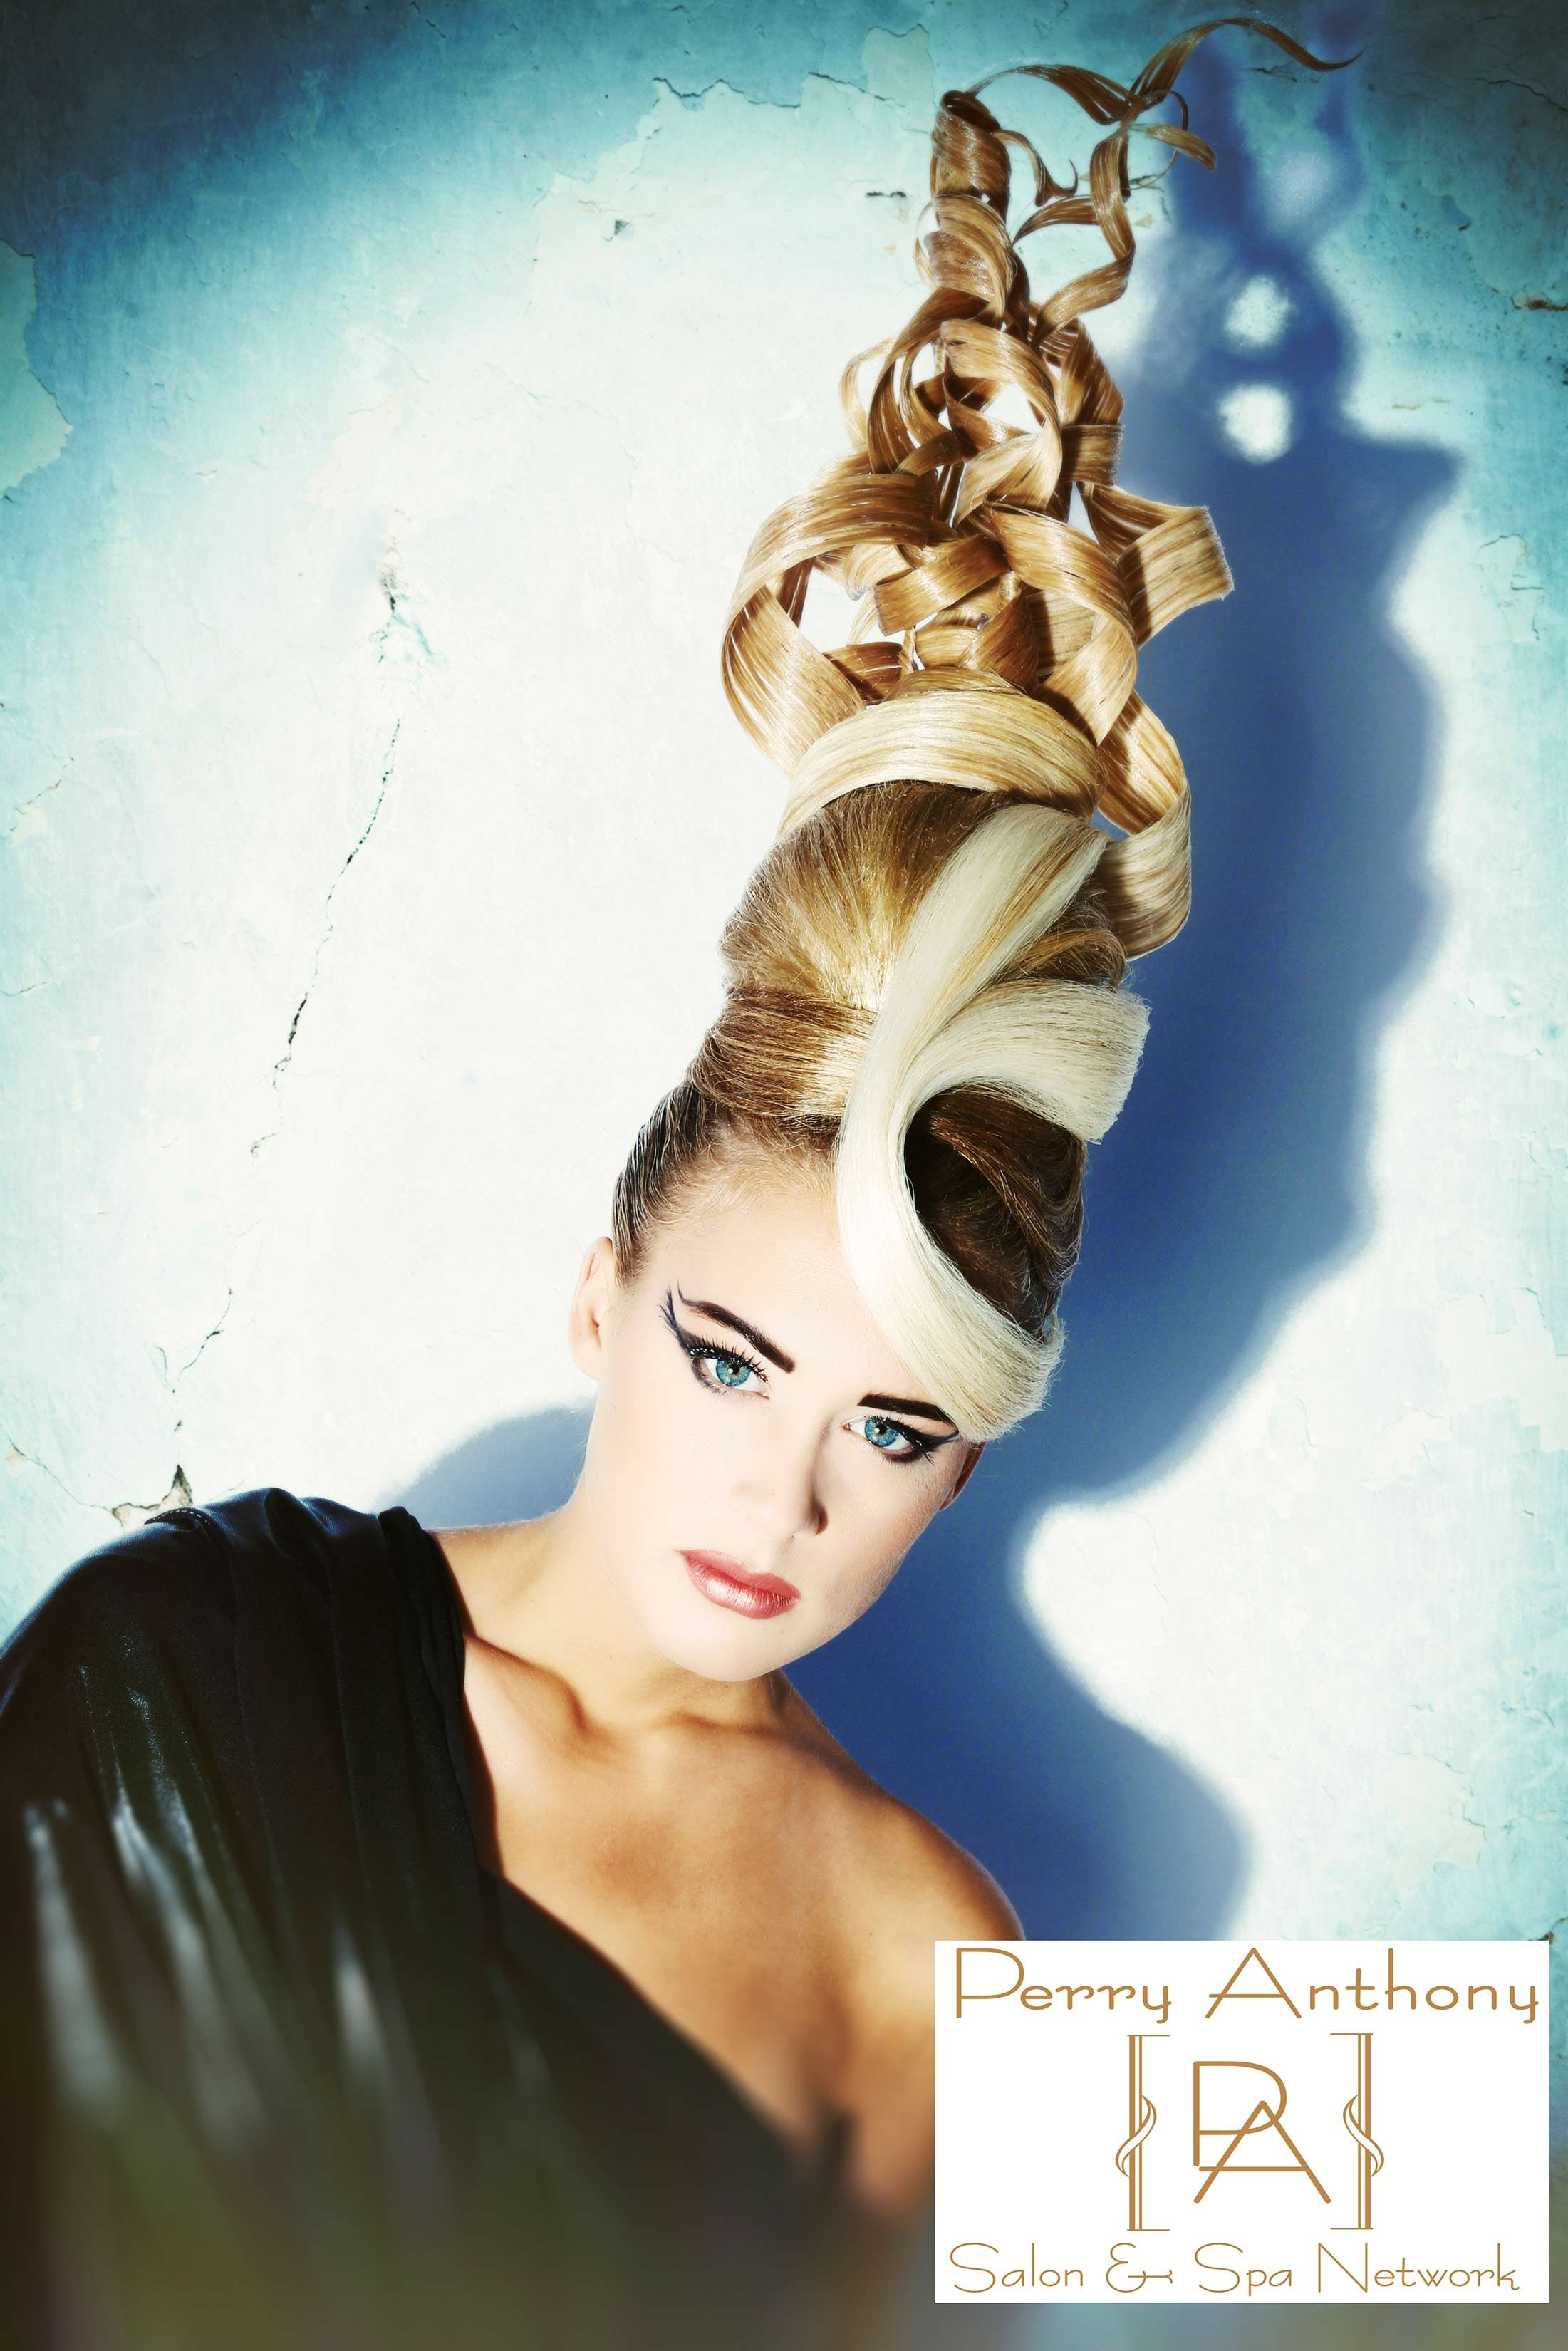 Perry Anthony Salon & Spa Wilmington DE avant garde hair updo